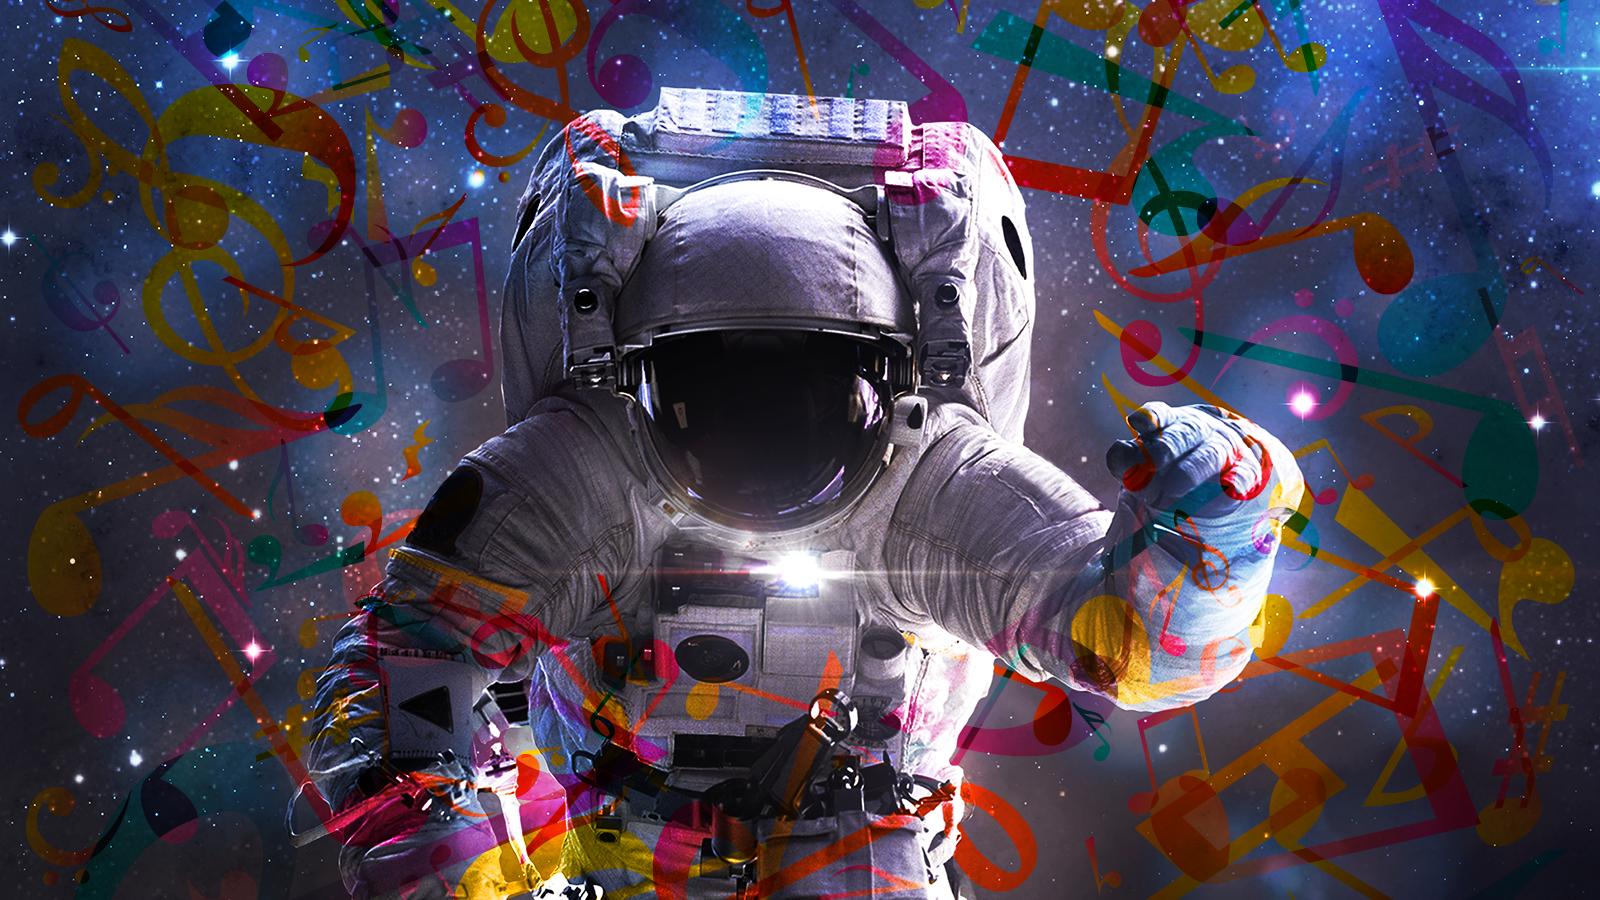 Psychedelic Astronaut wwwpixsharkcom   Images 1600x900